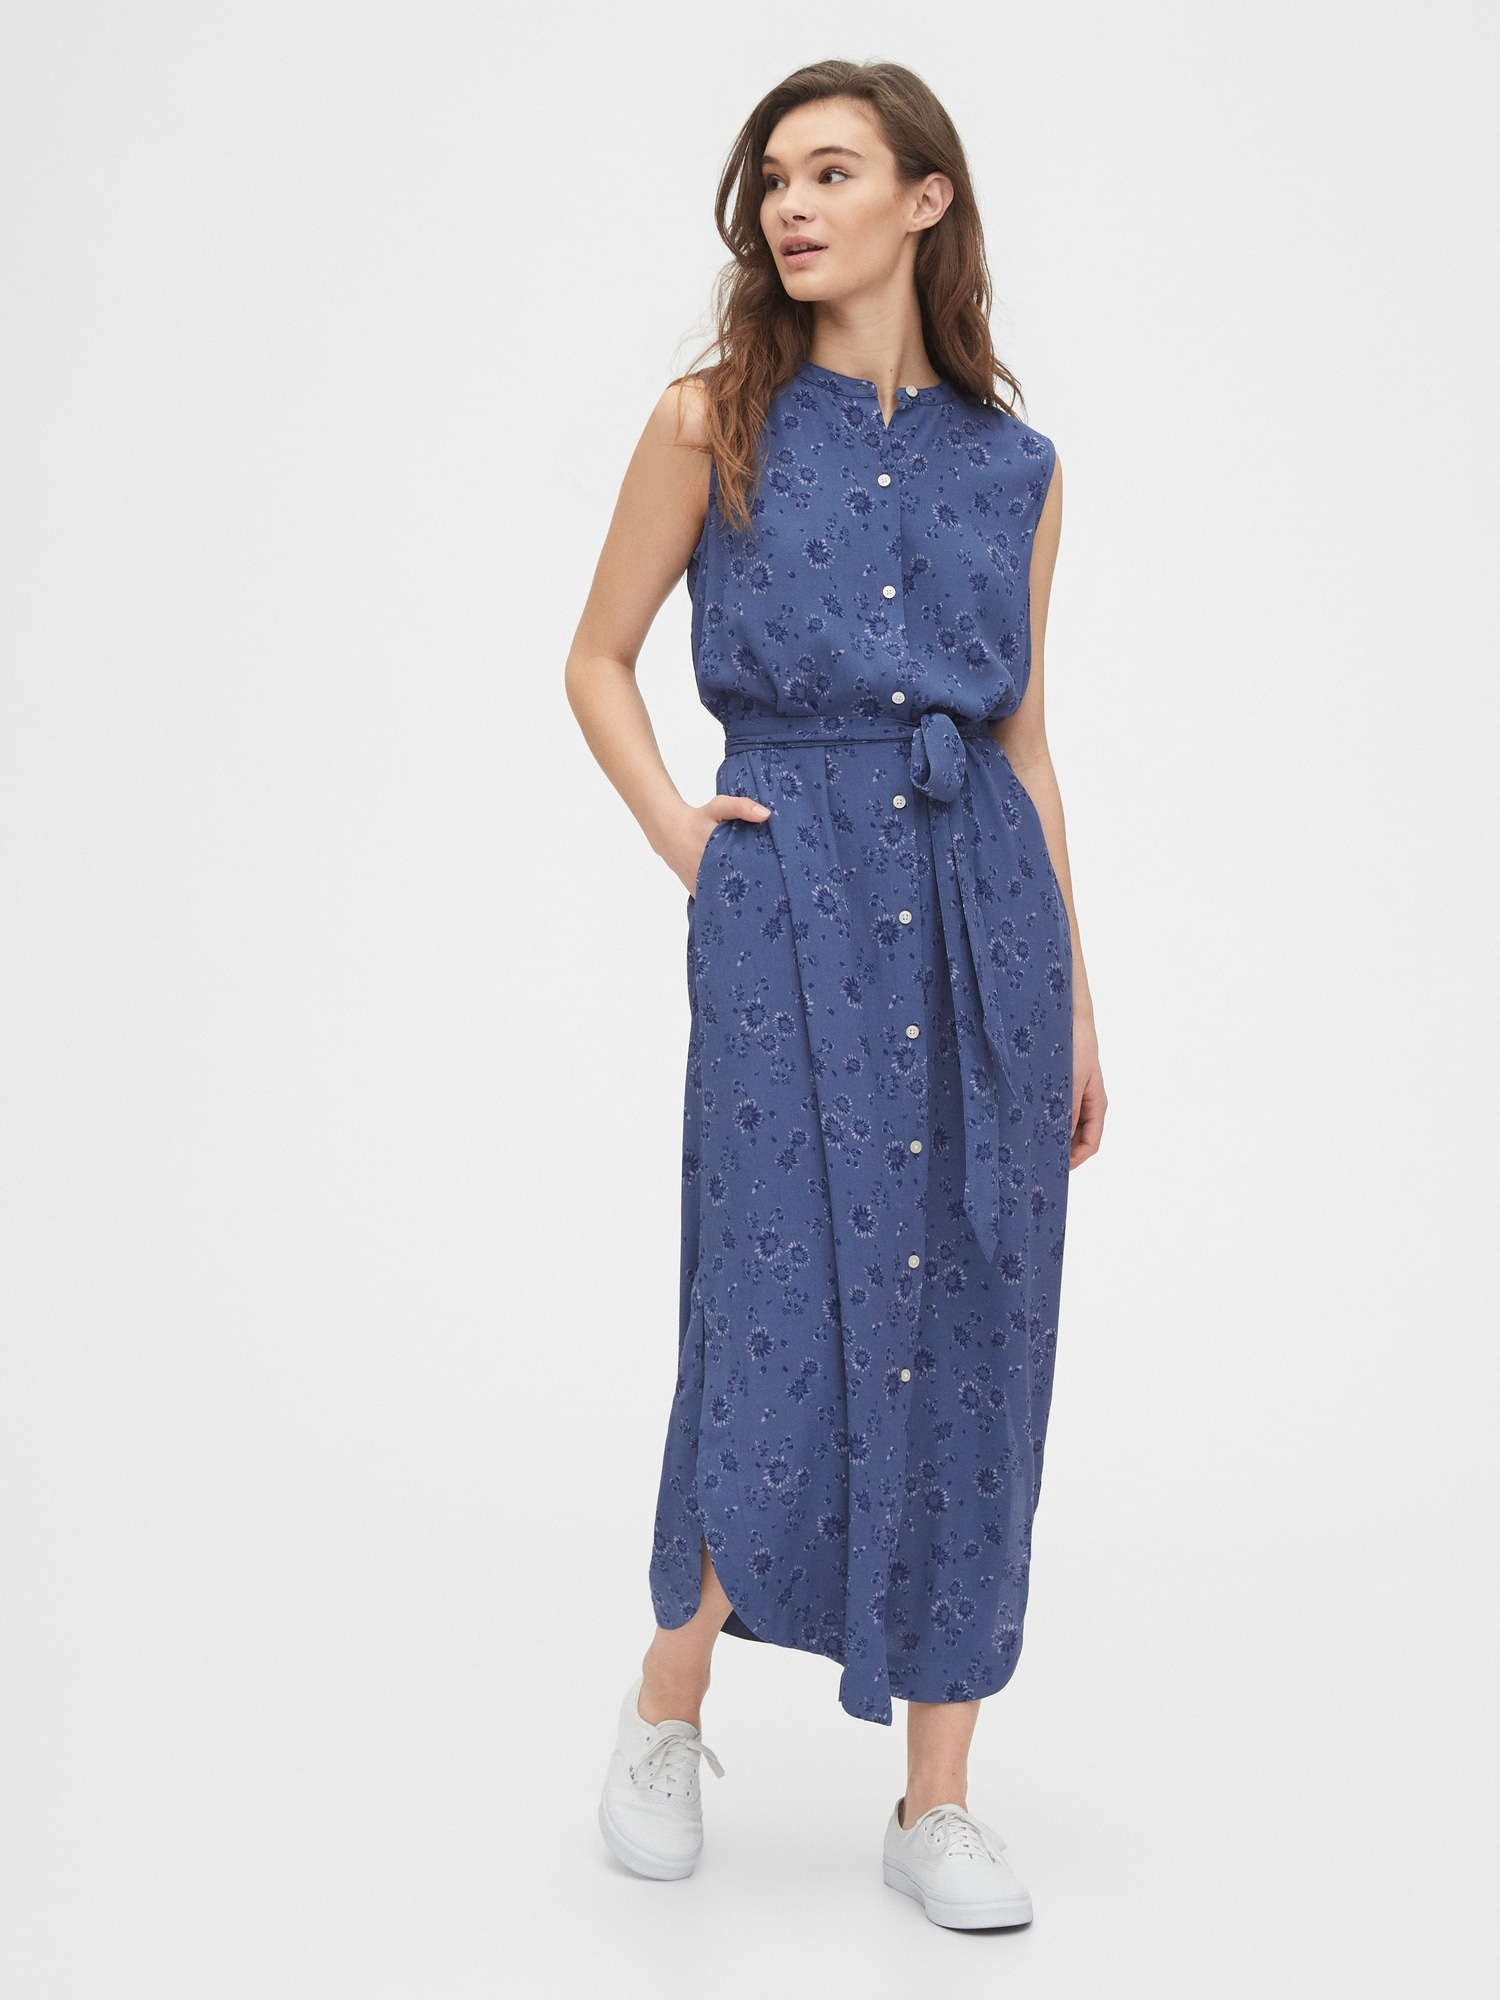 Wonderlijk Sleeveless Maxi Shirtdress | Gap FM-91